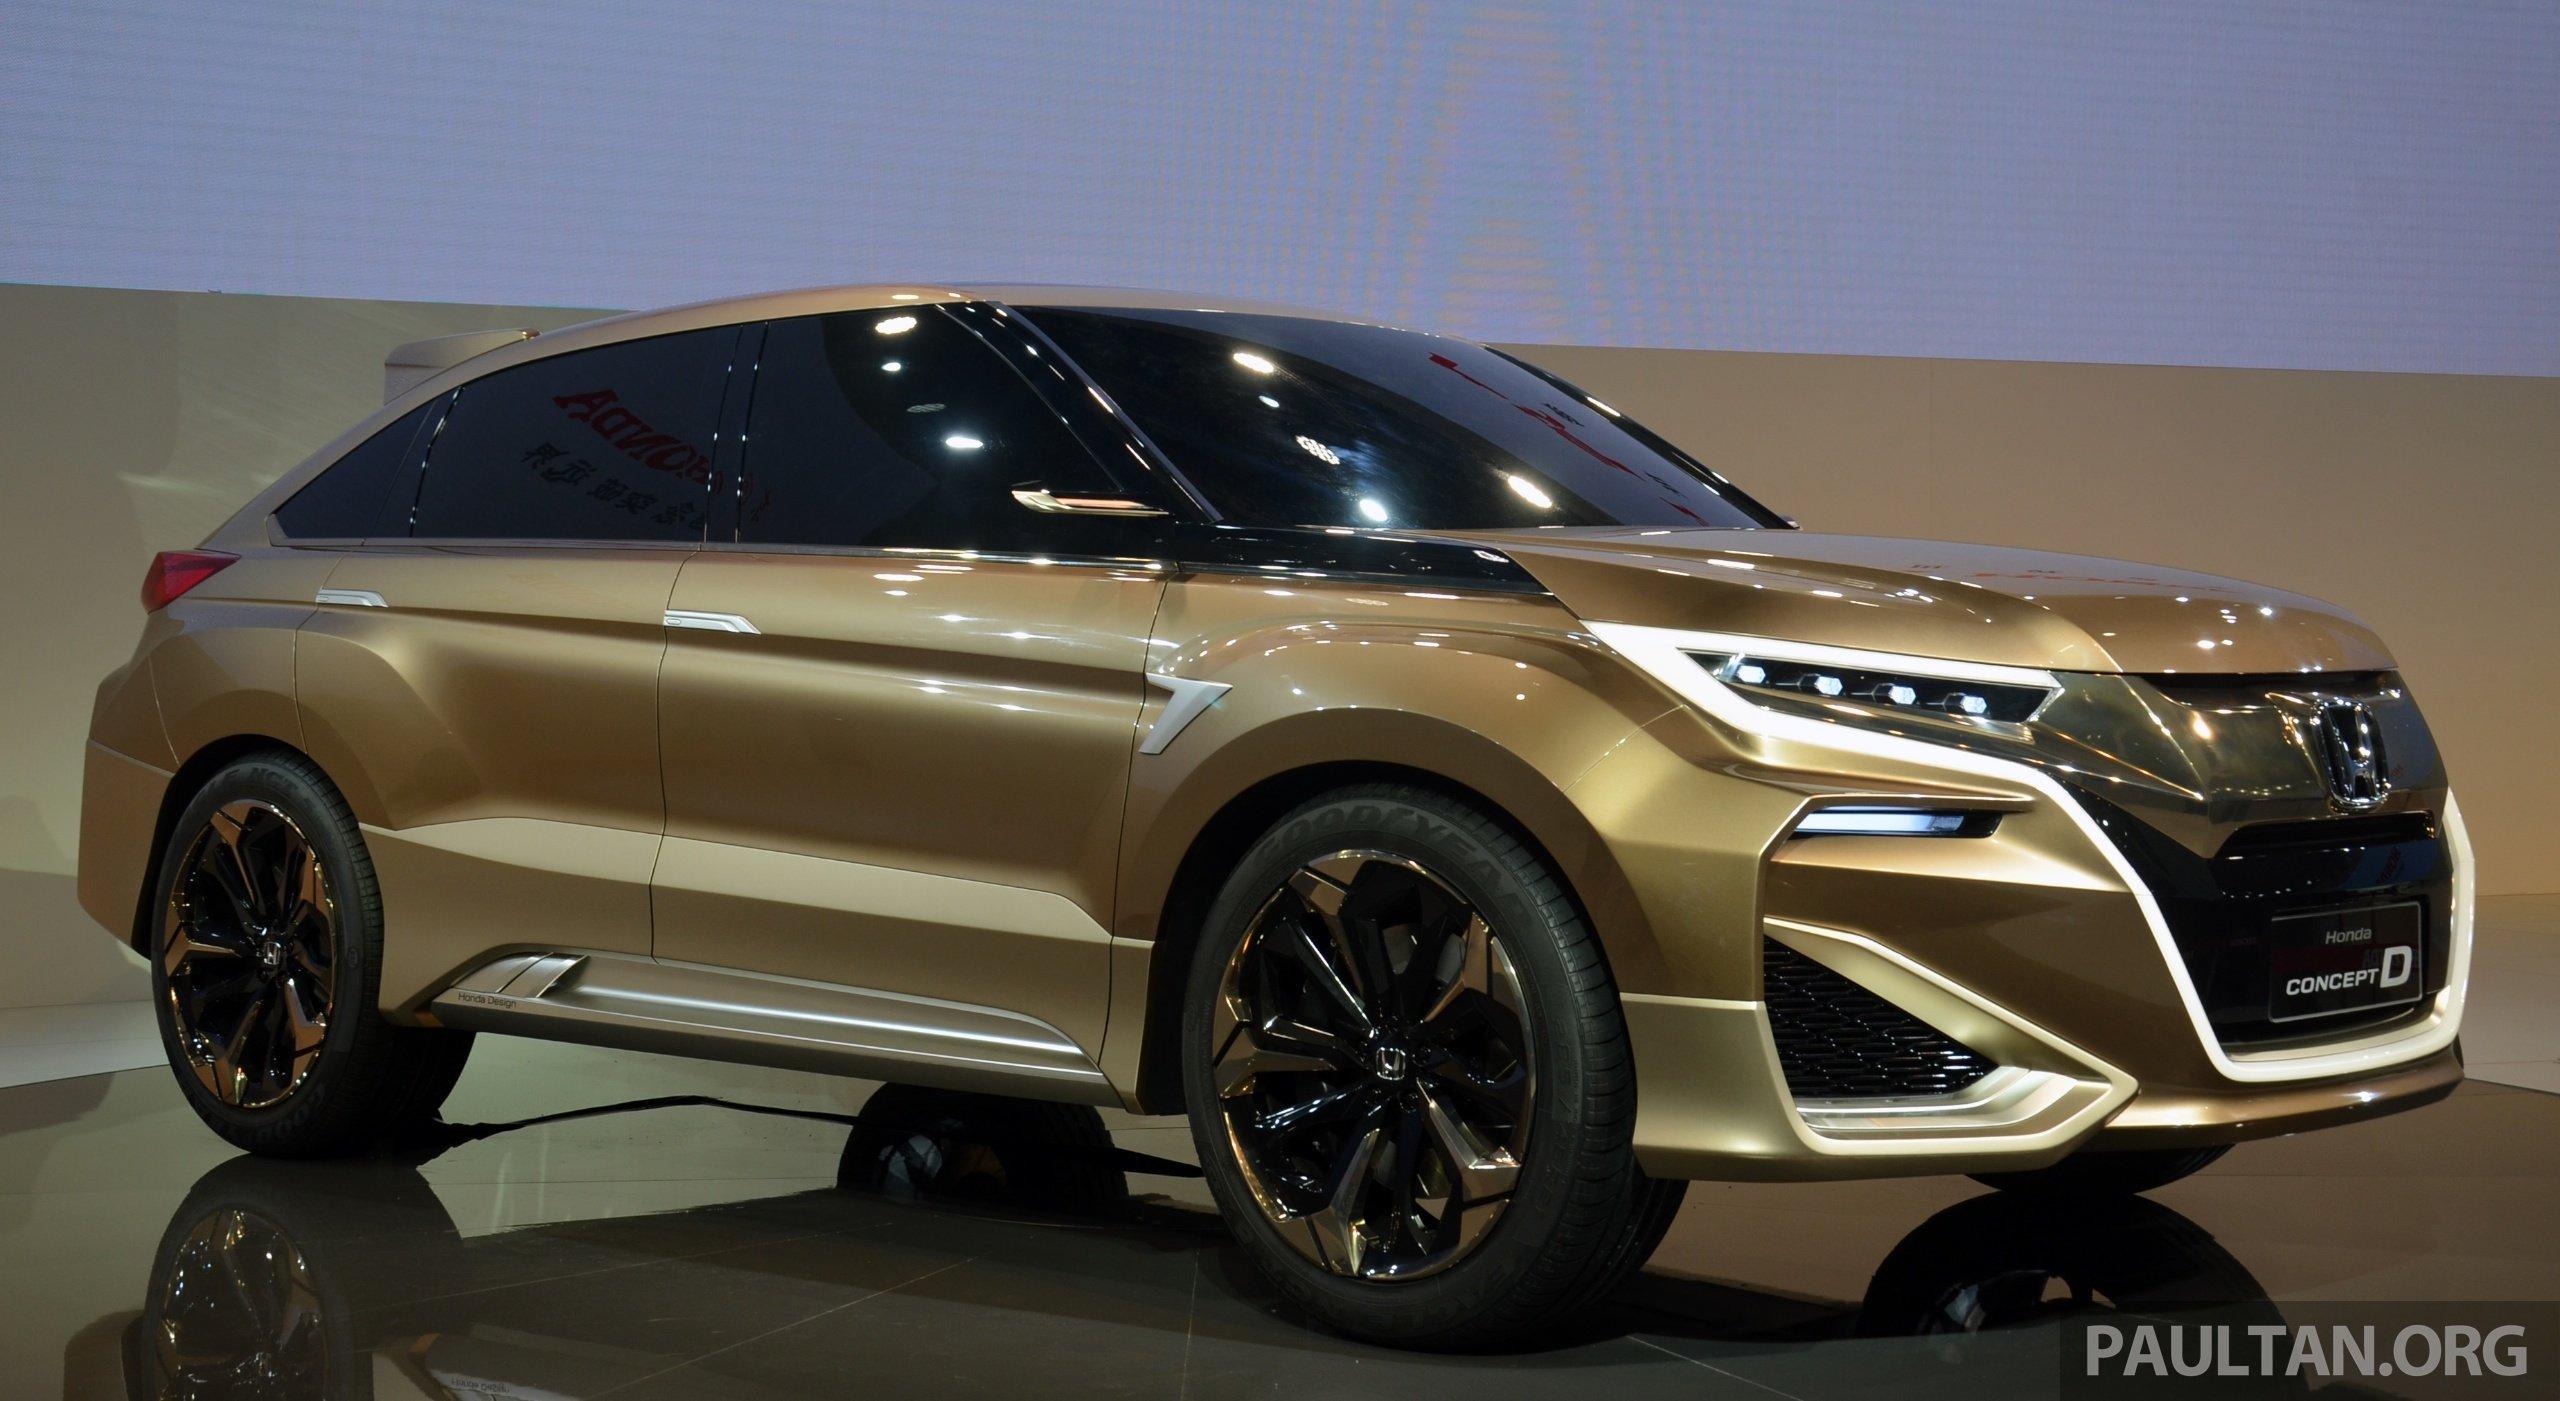 Honda Crv Hybrid >> Shanghai 2015: Honda Concept D previews new SUV Image 330310